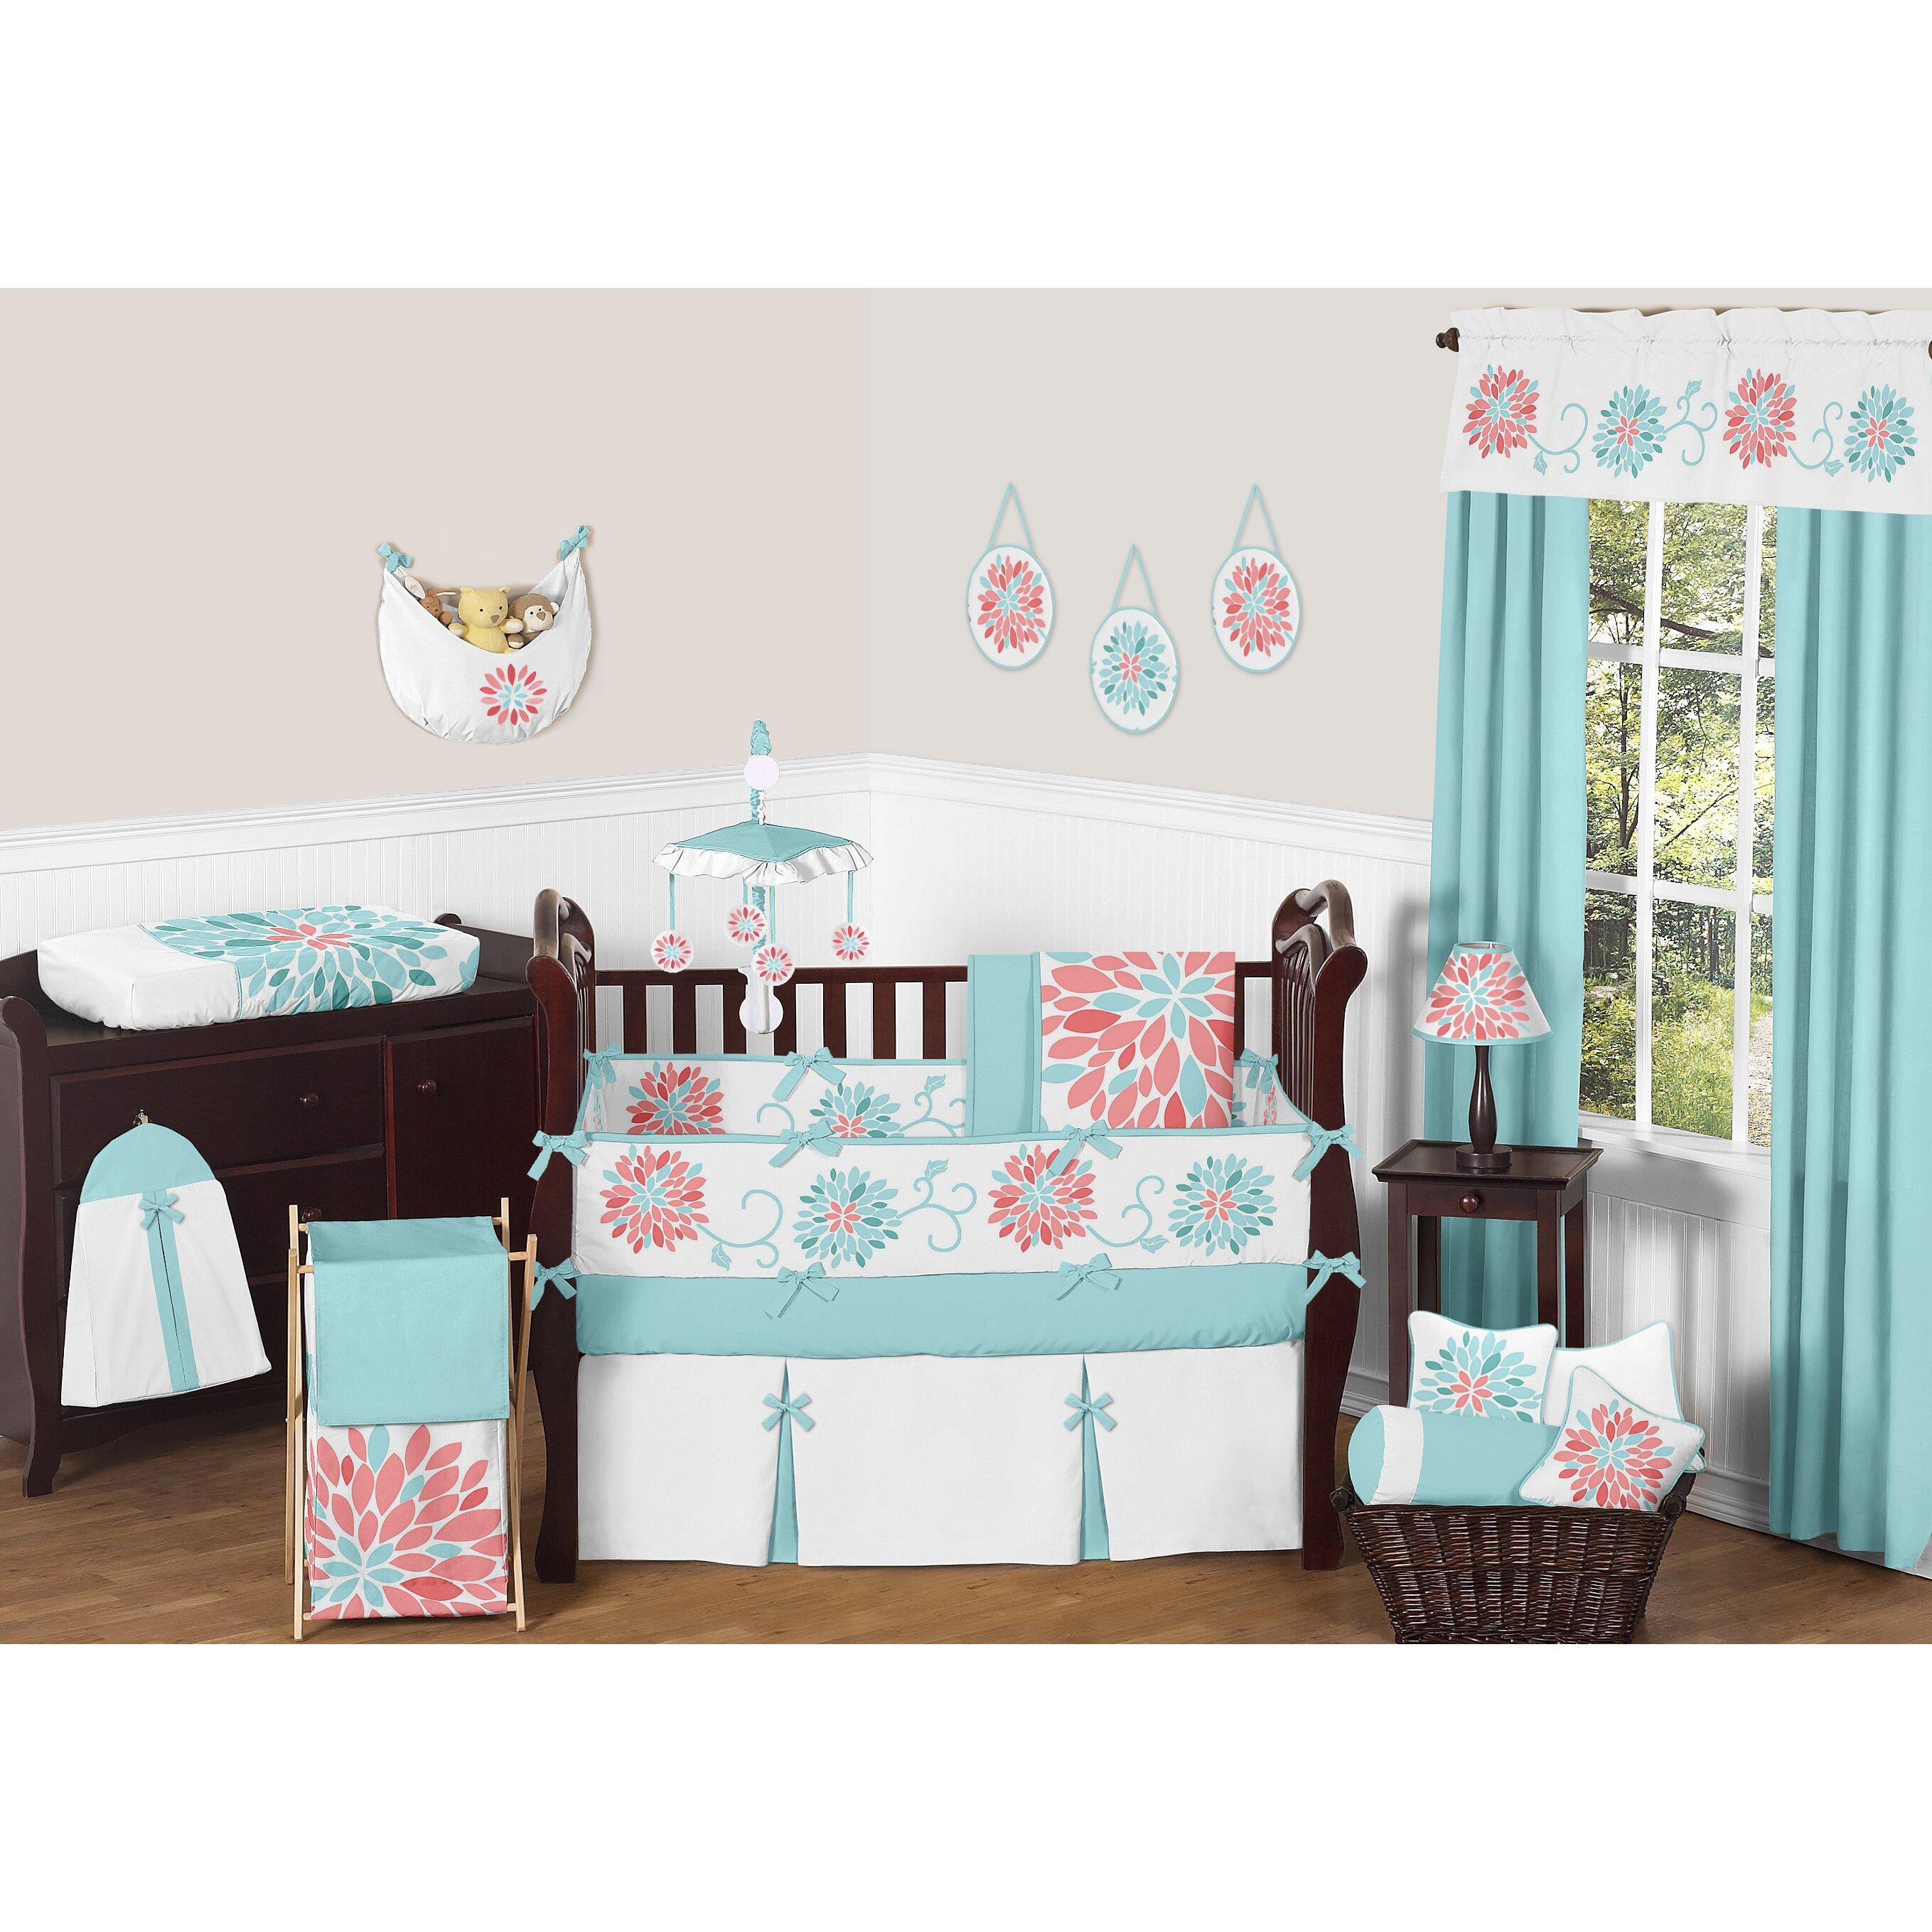 Emma iron crib for sale - Sweet Jojo Designs Emma 9 Piece Crib Bedding Set